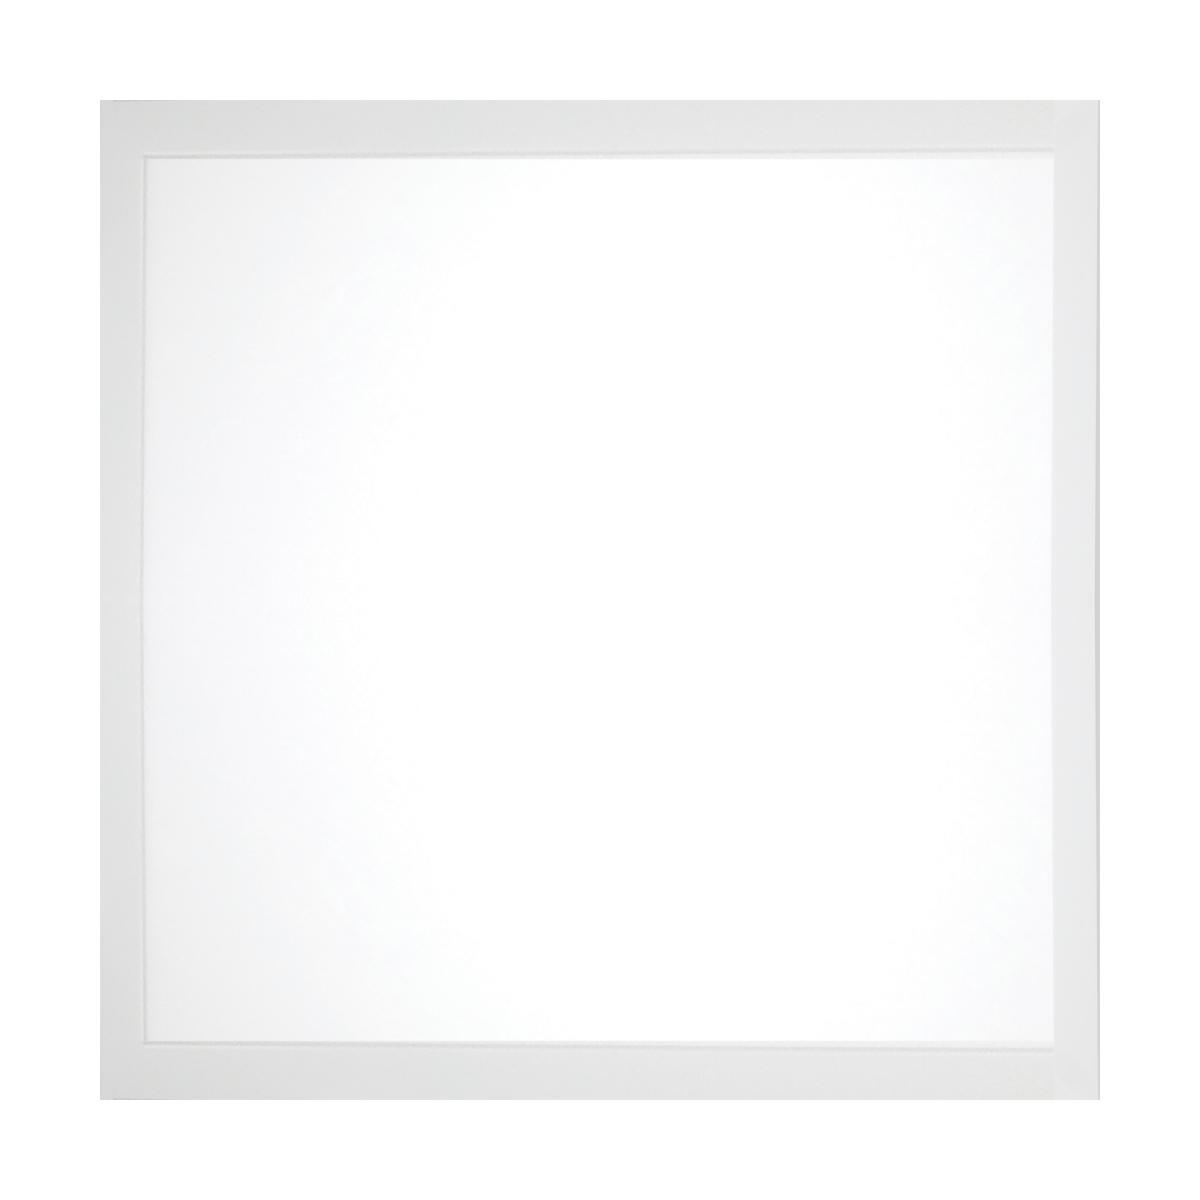 65-571 2X2 LED BACKLIT FLAT PANEL